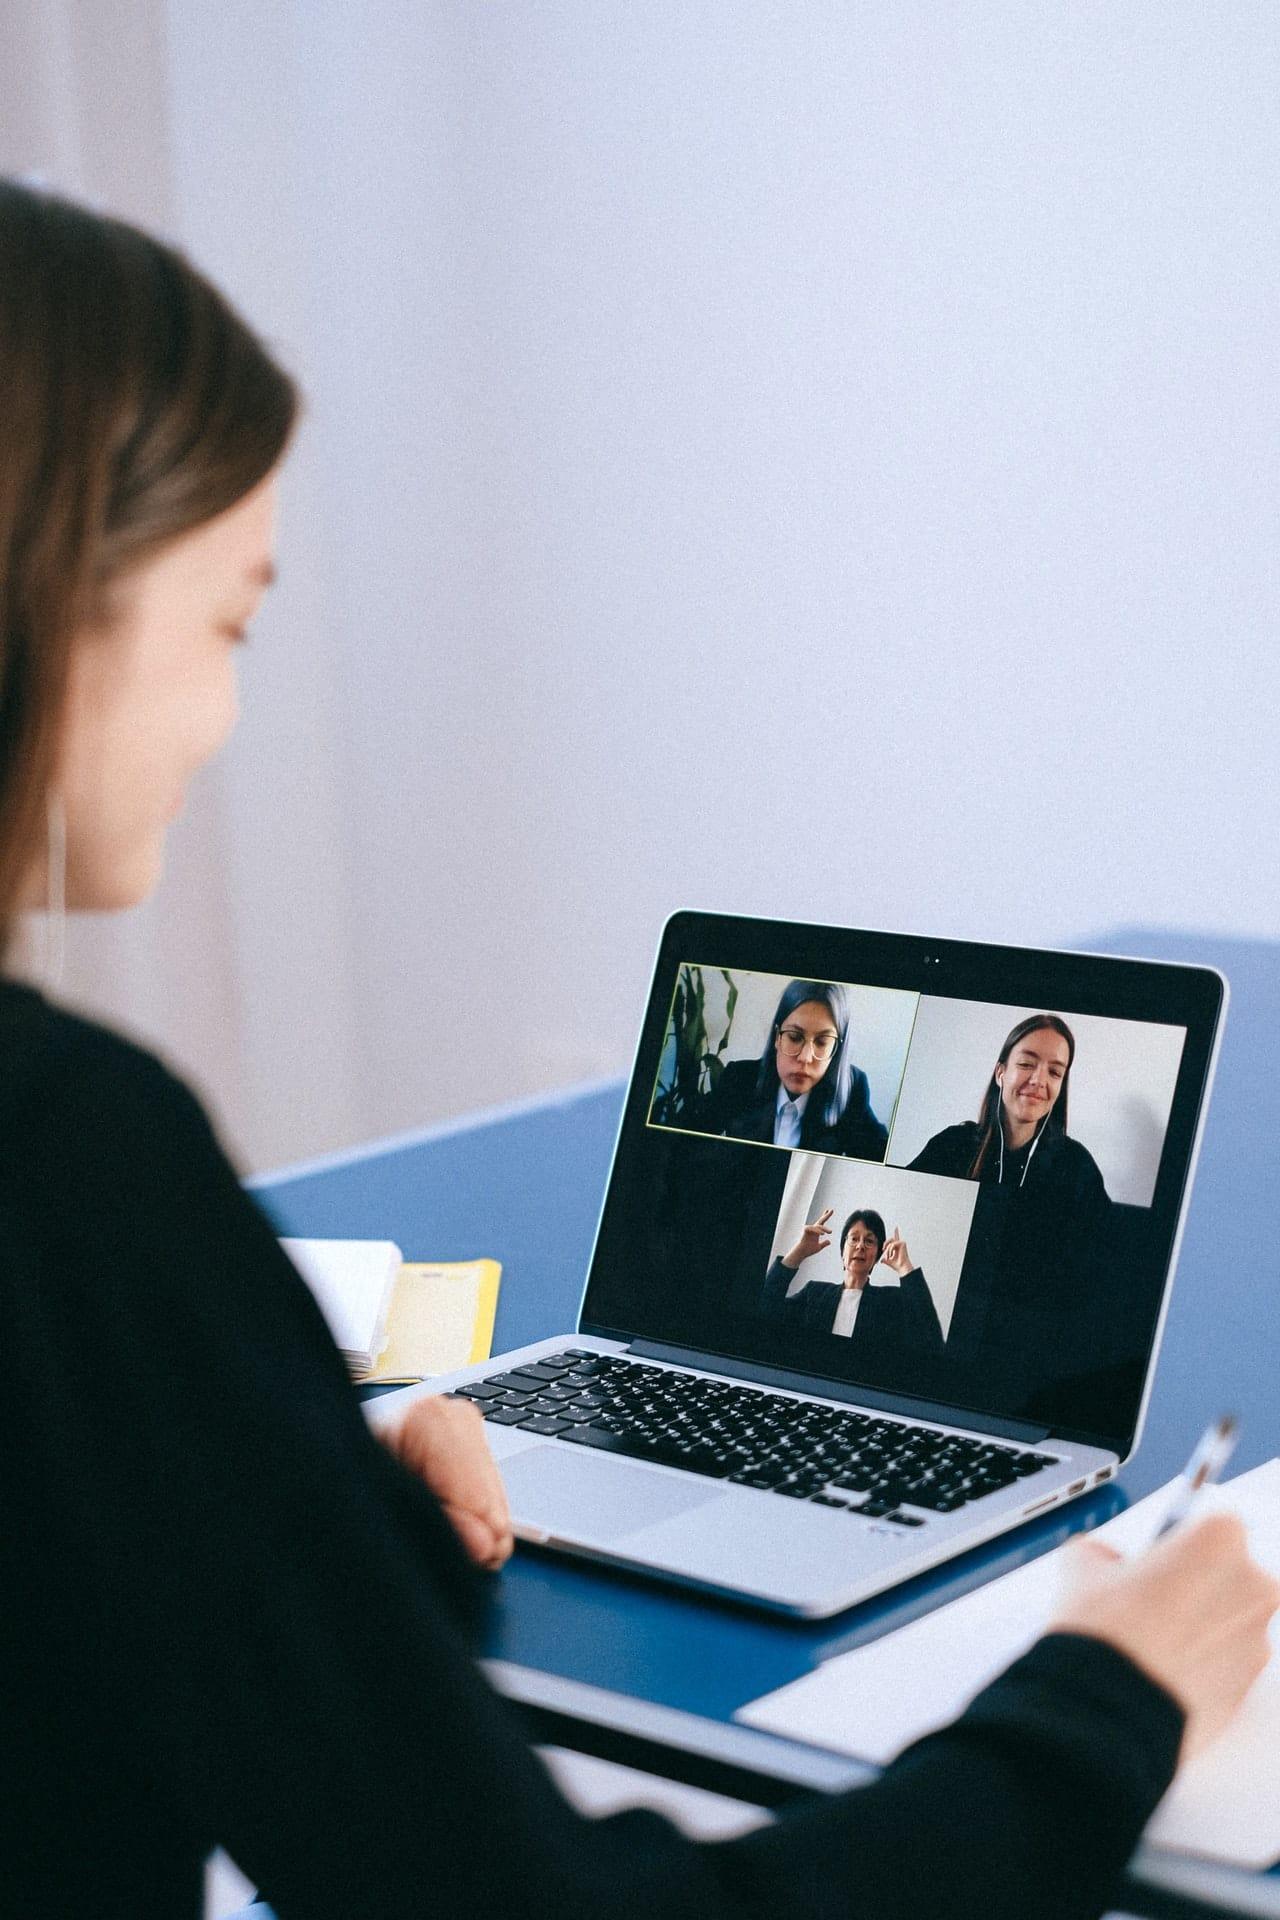 Business Meetings Online 2021 Article Image